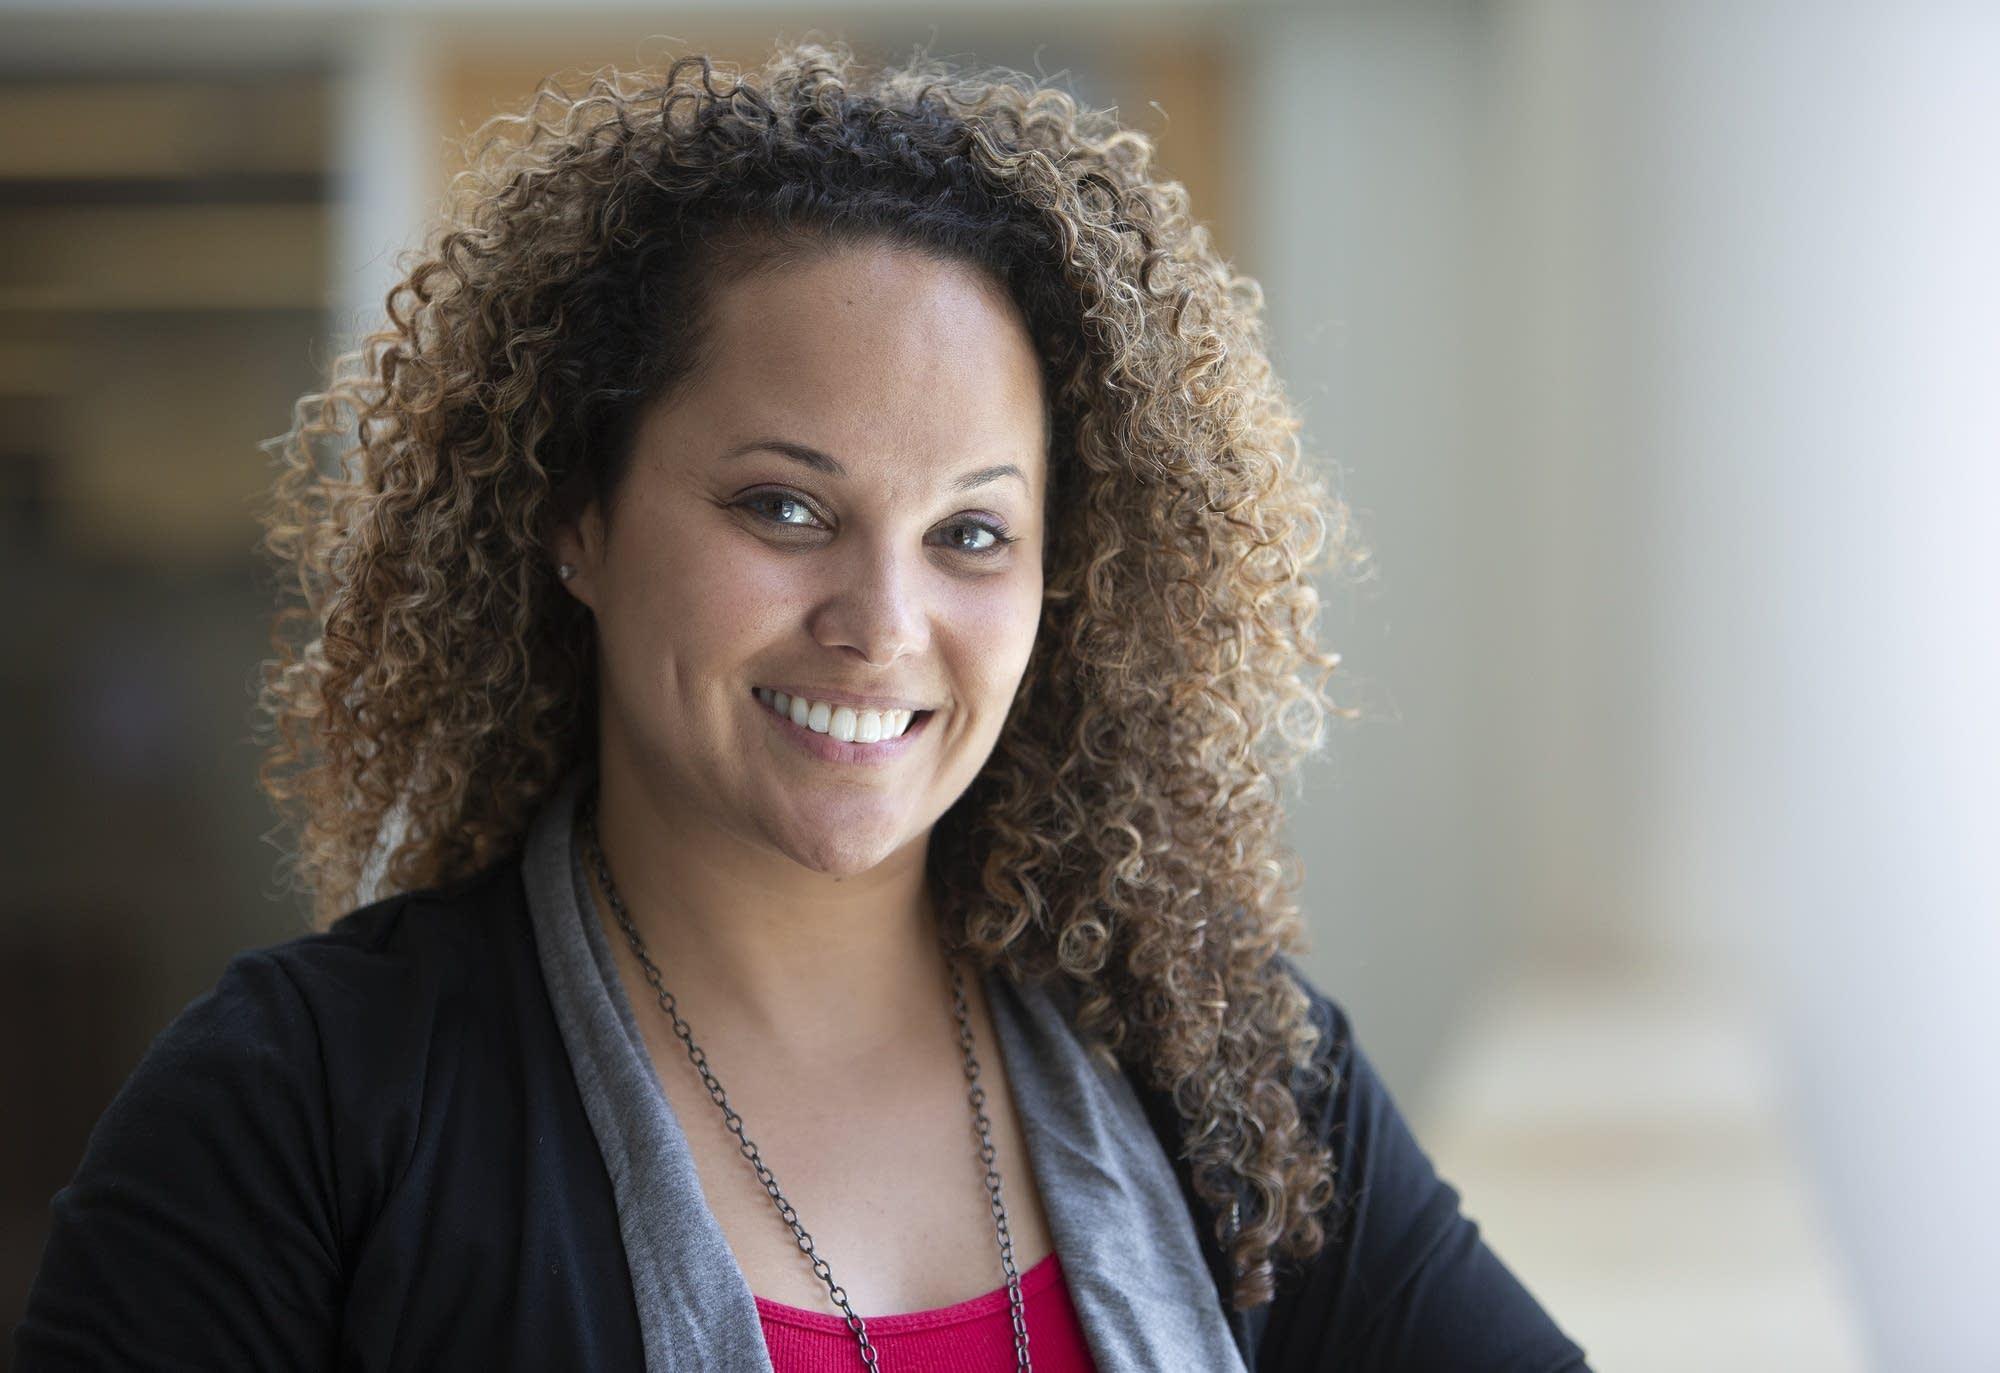 Jessica Davis was named Minnesota Teacher of the Year.